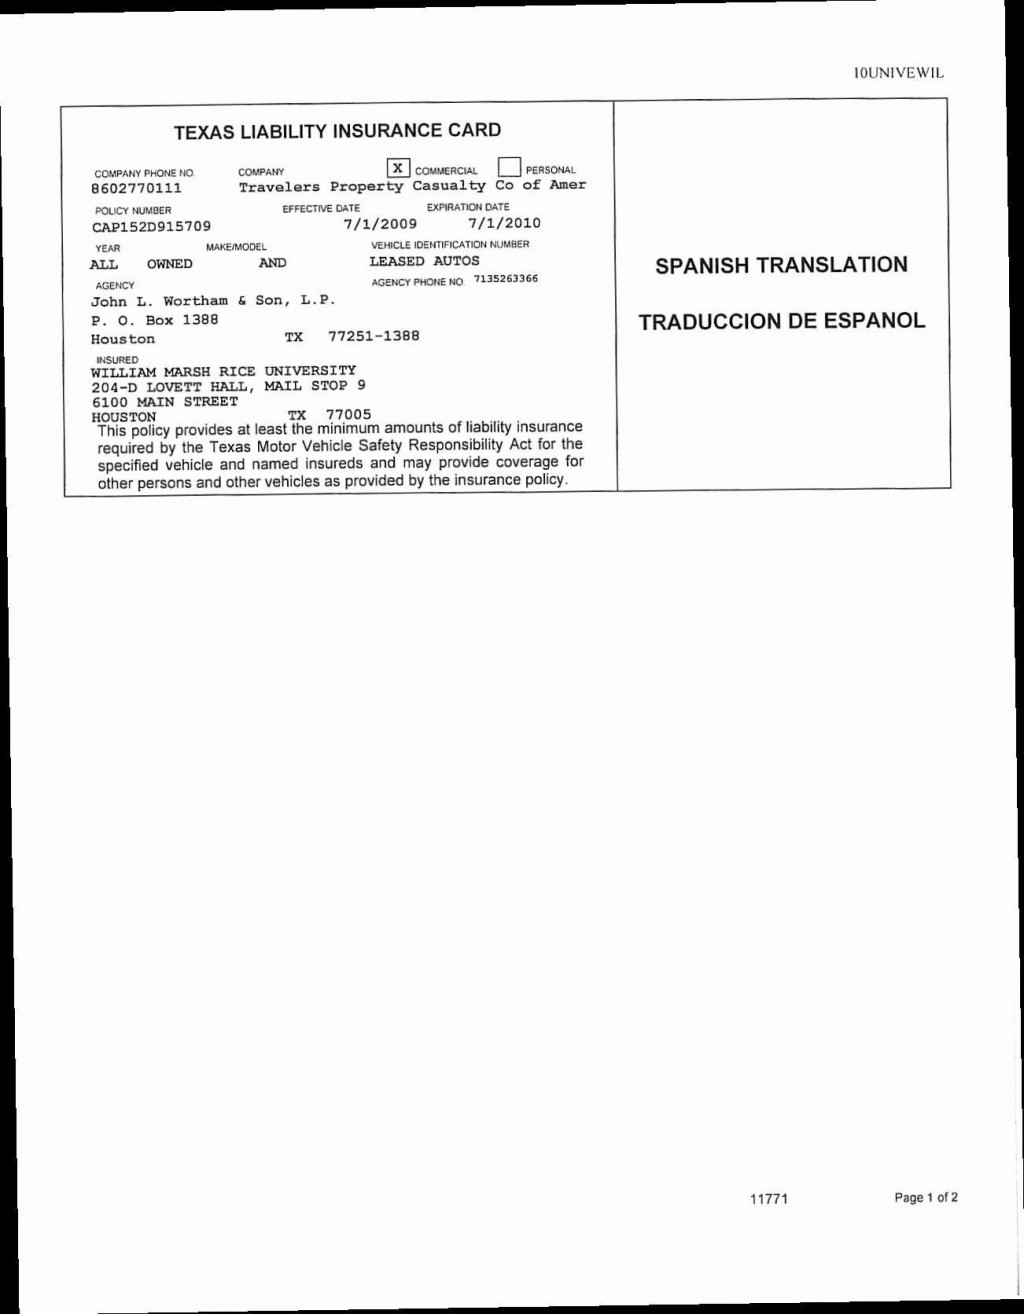 008 Incredible Auto Insurance Card Template Pdf Concept  Car Fake Geico FillerLarge